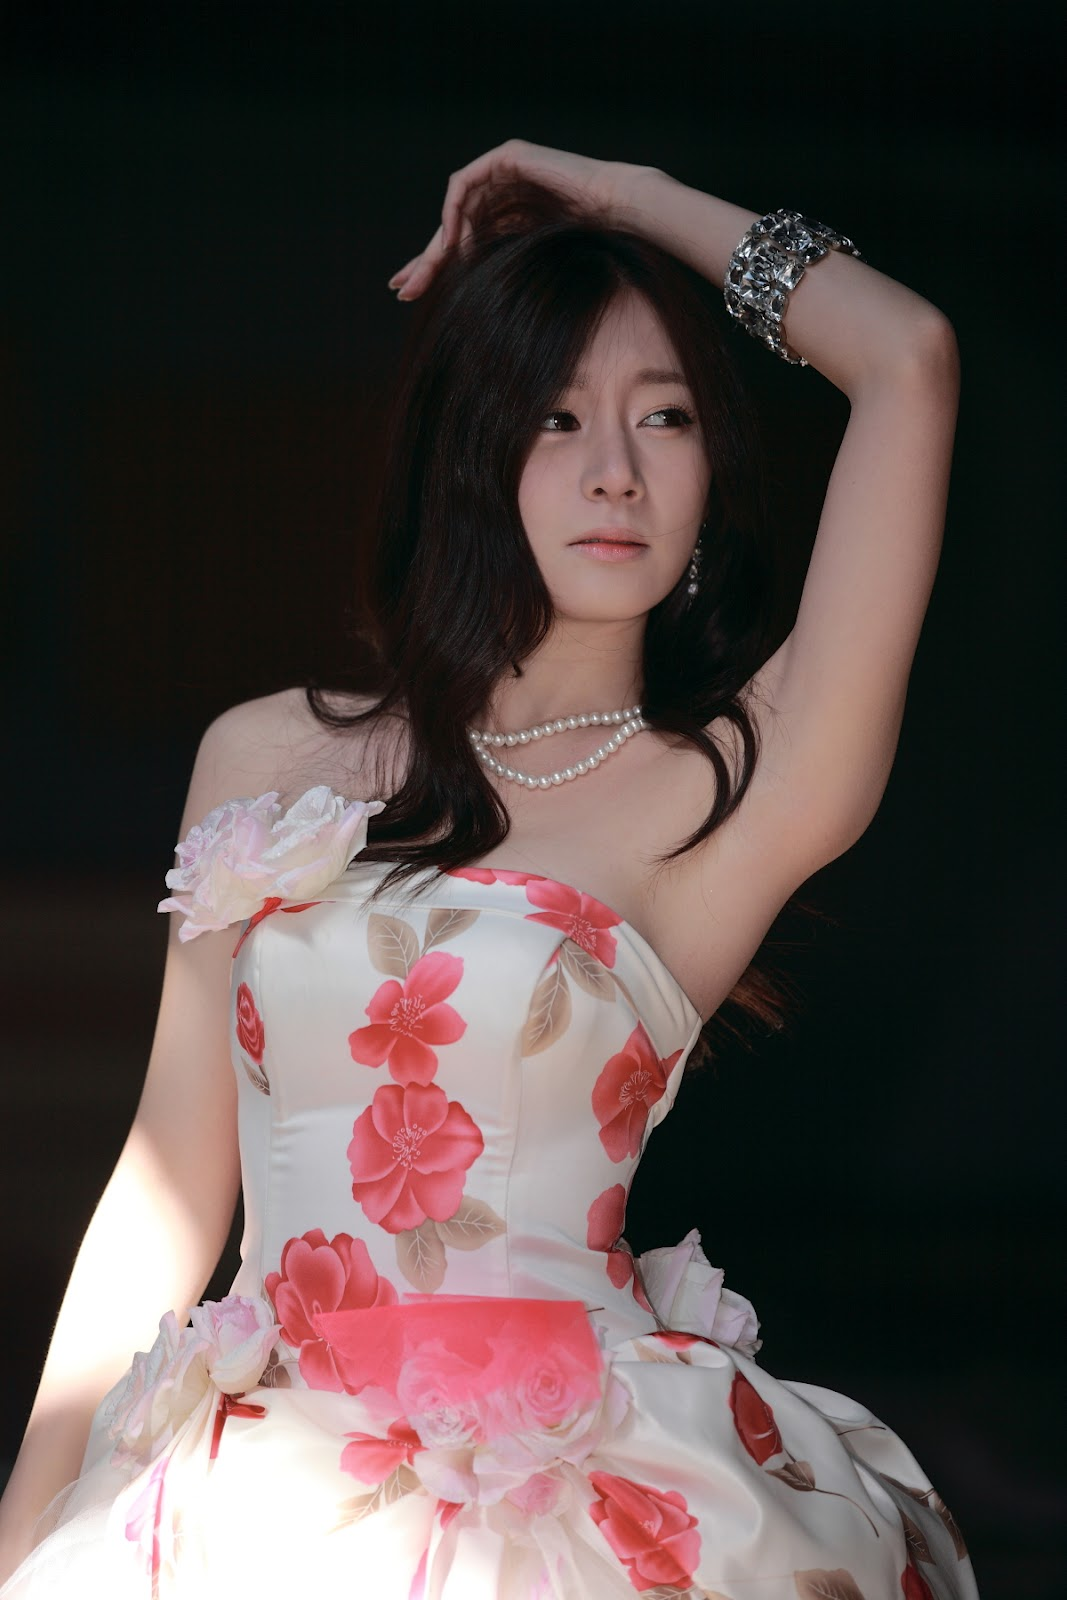 xxx nude girls: Han Ji Eun in Pink